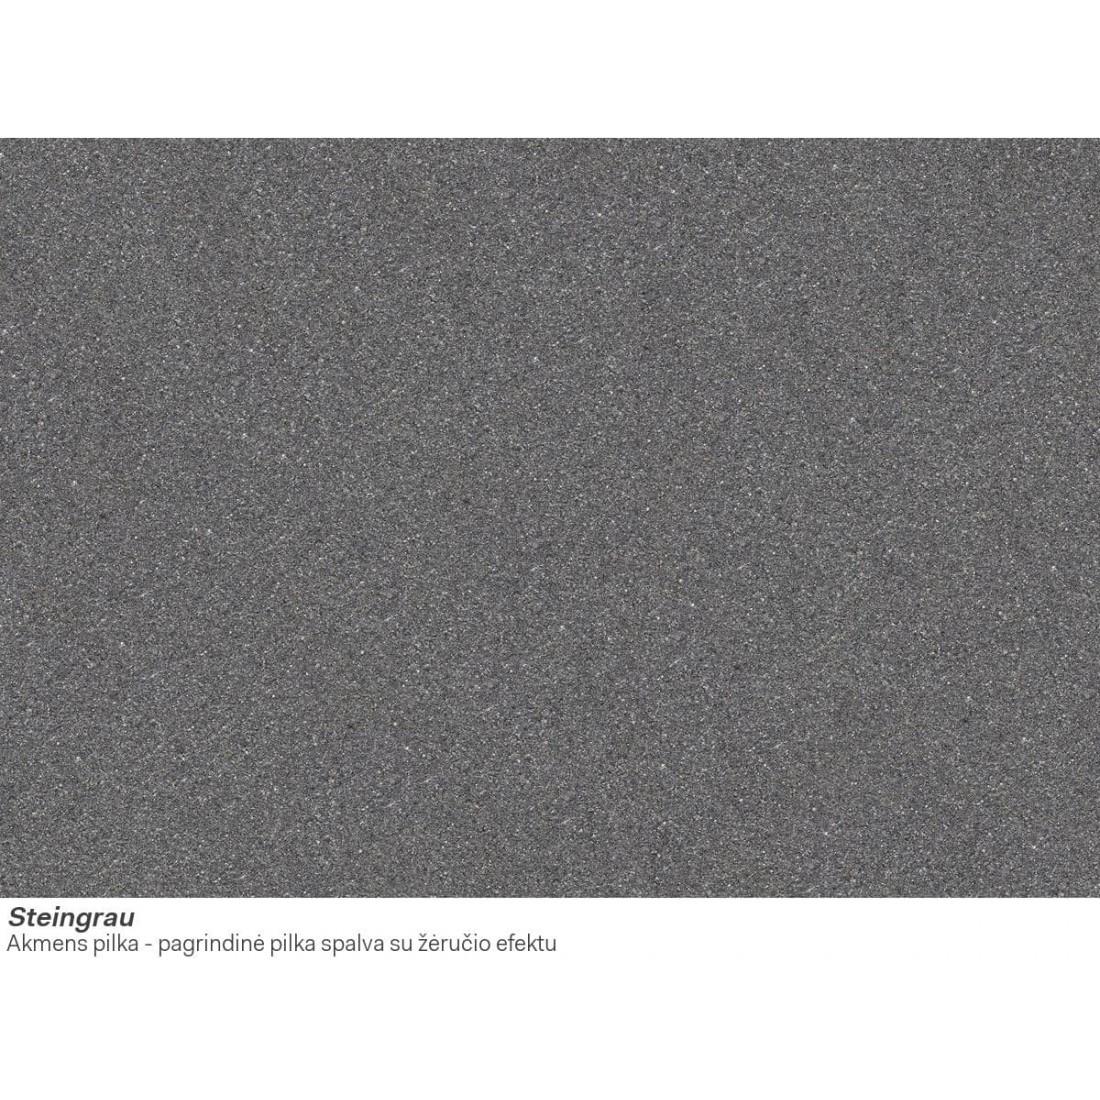 Akmens masės plautuvė Franke FX FXG 661, Steingrau